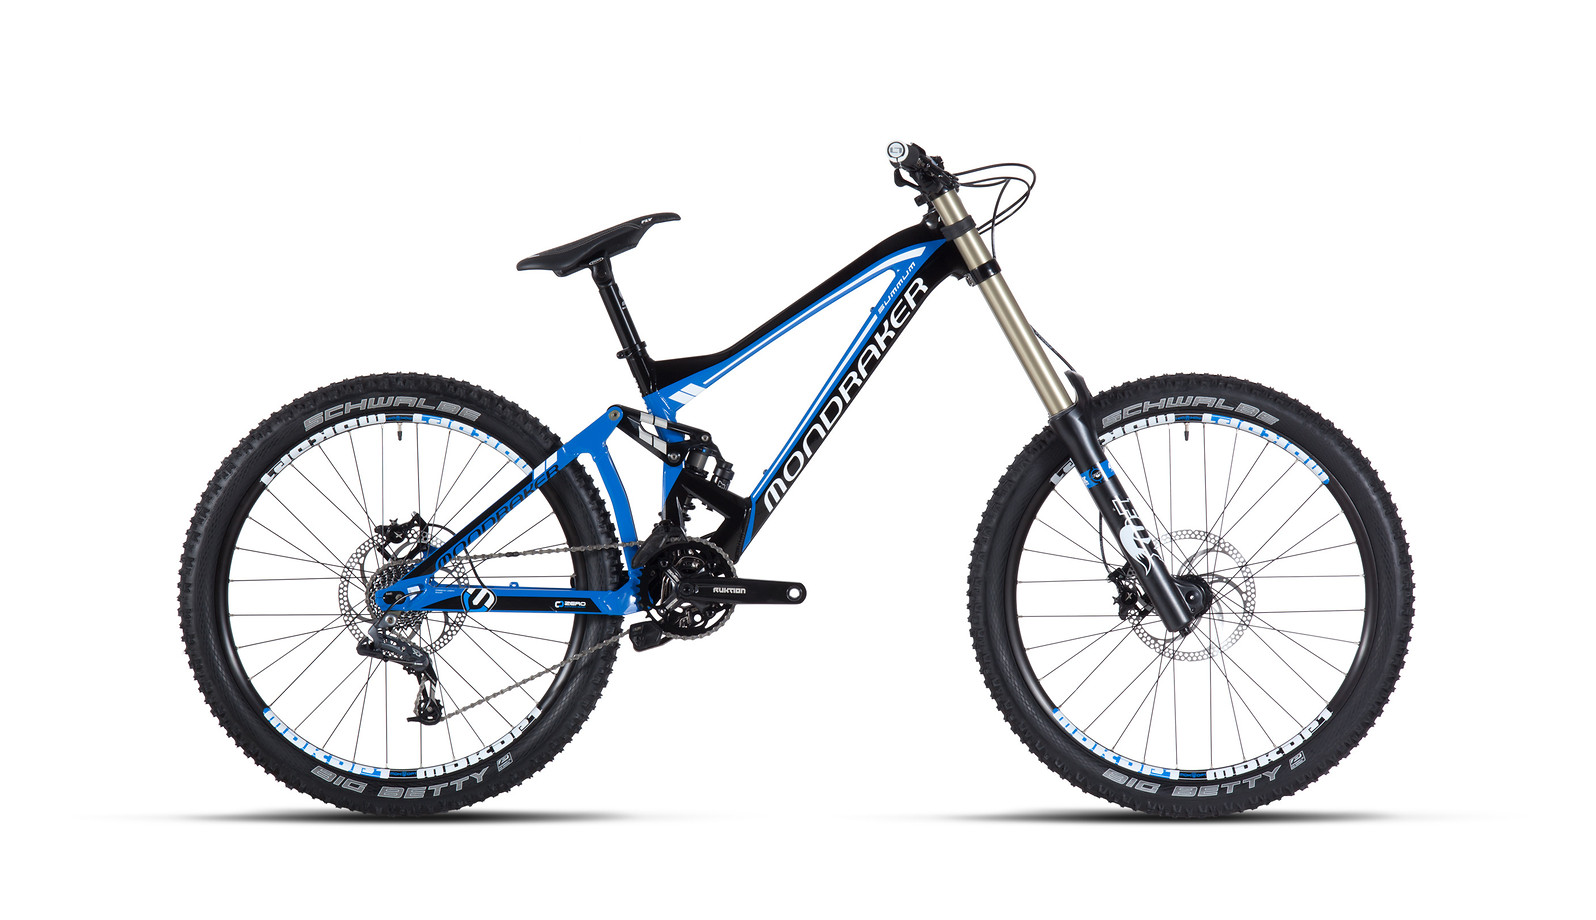 2013 Mondraker Summum Bike bike - mondraker summum